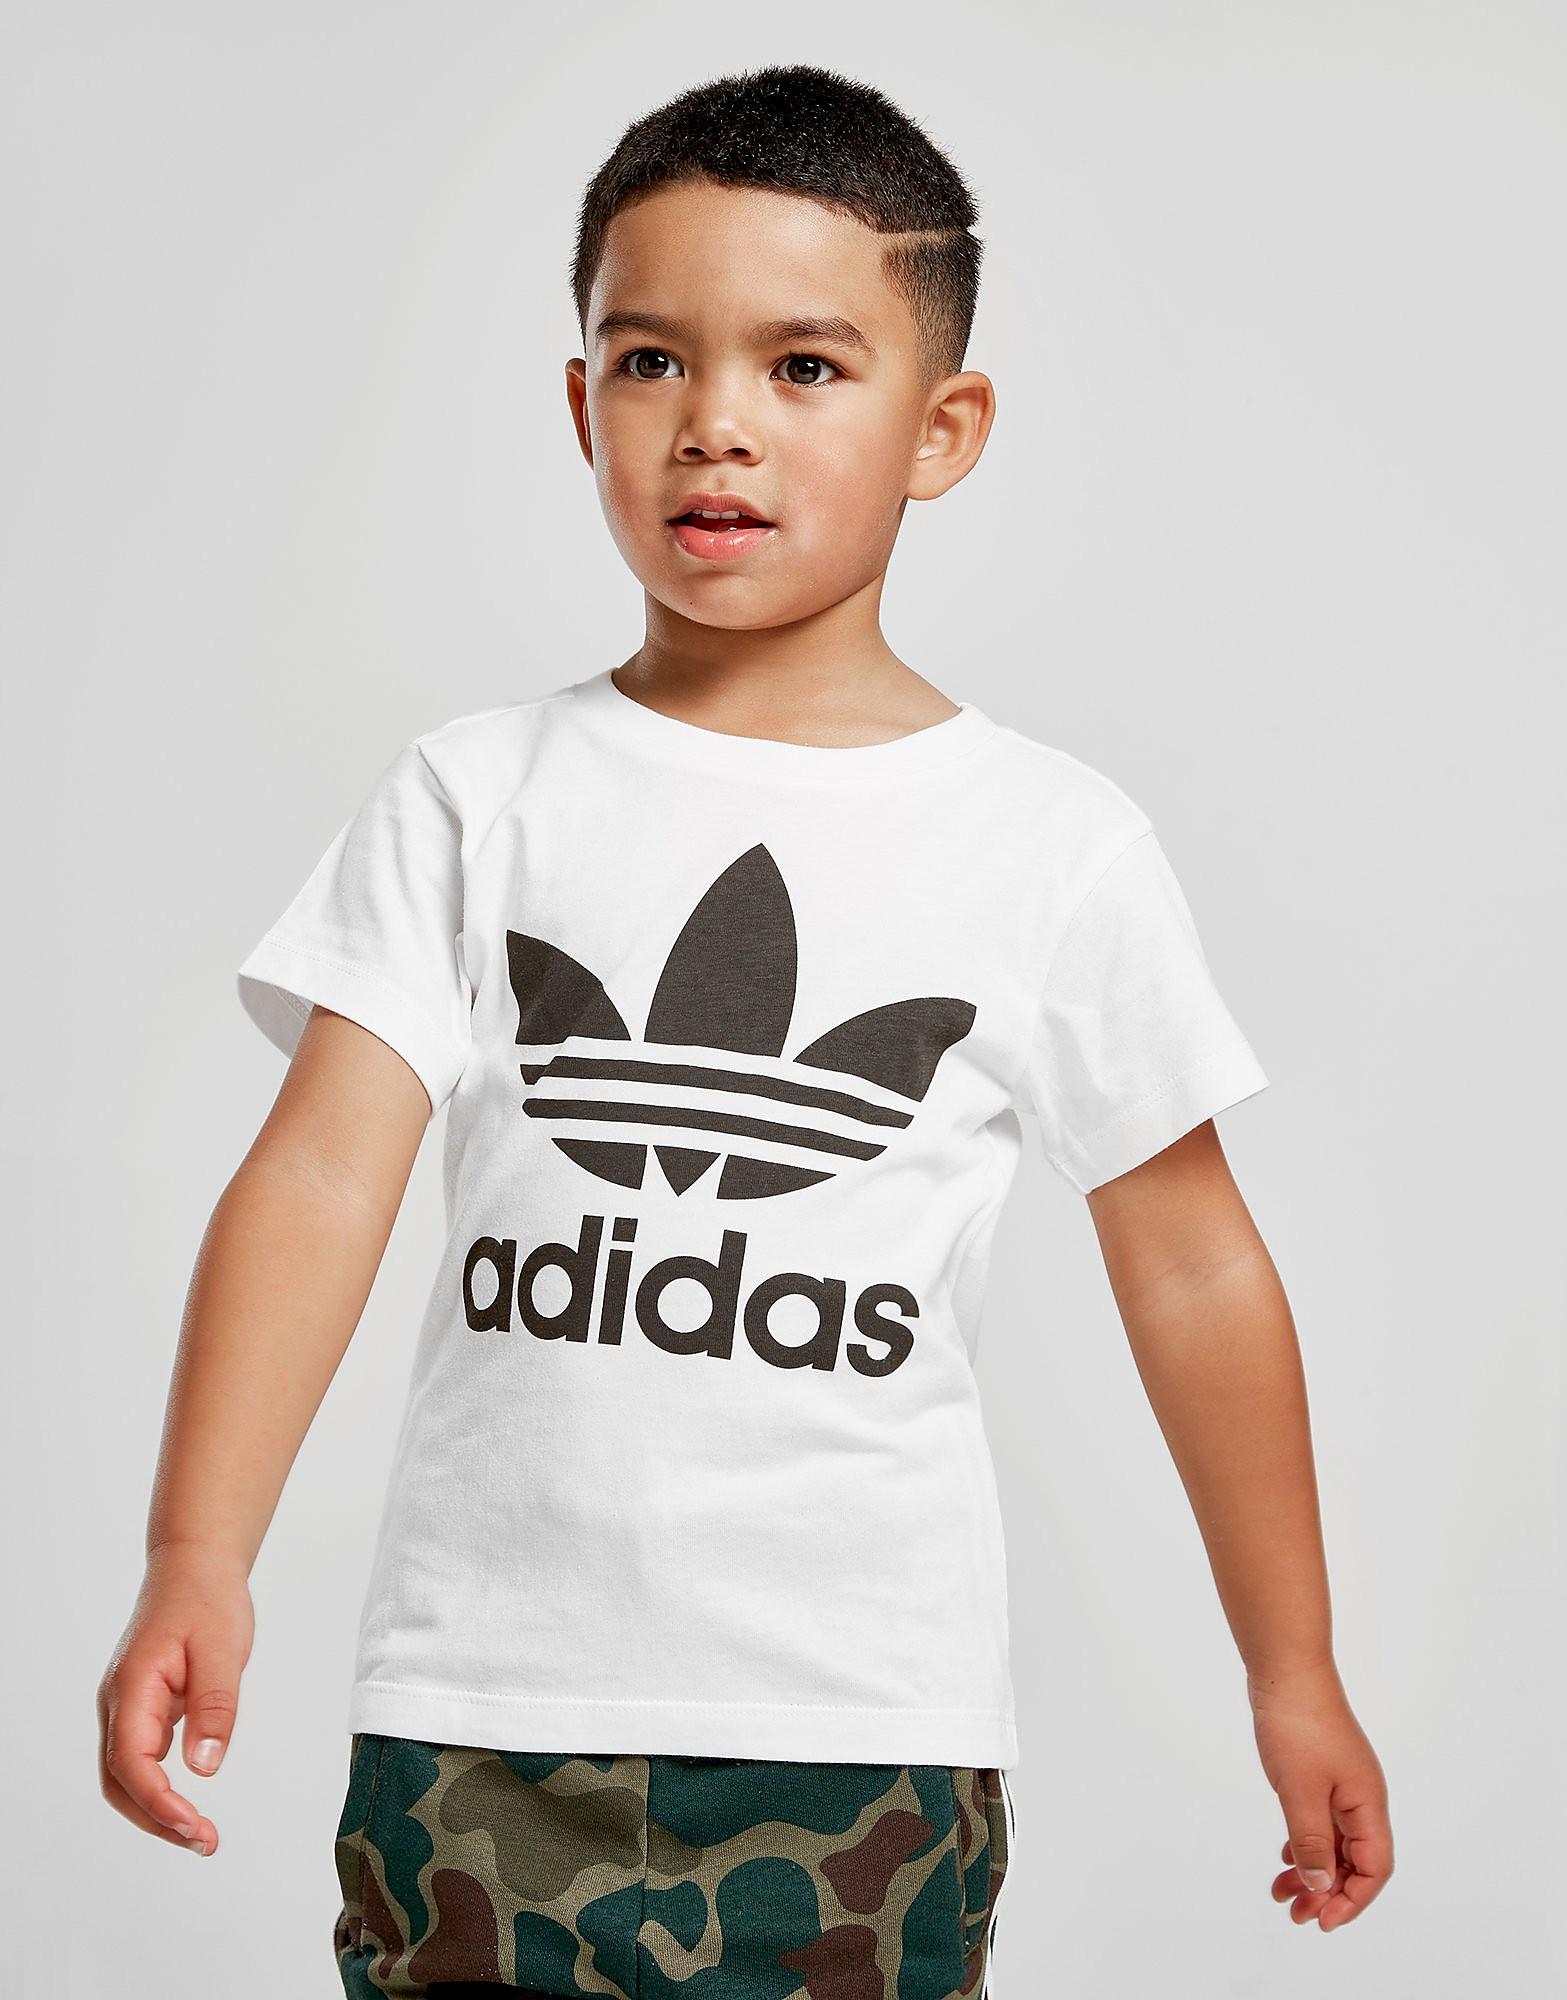 adidas Originals Trefoil T-Shirt Children - Wit - Kind